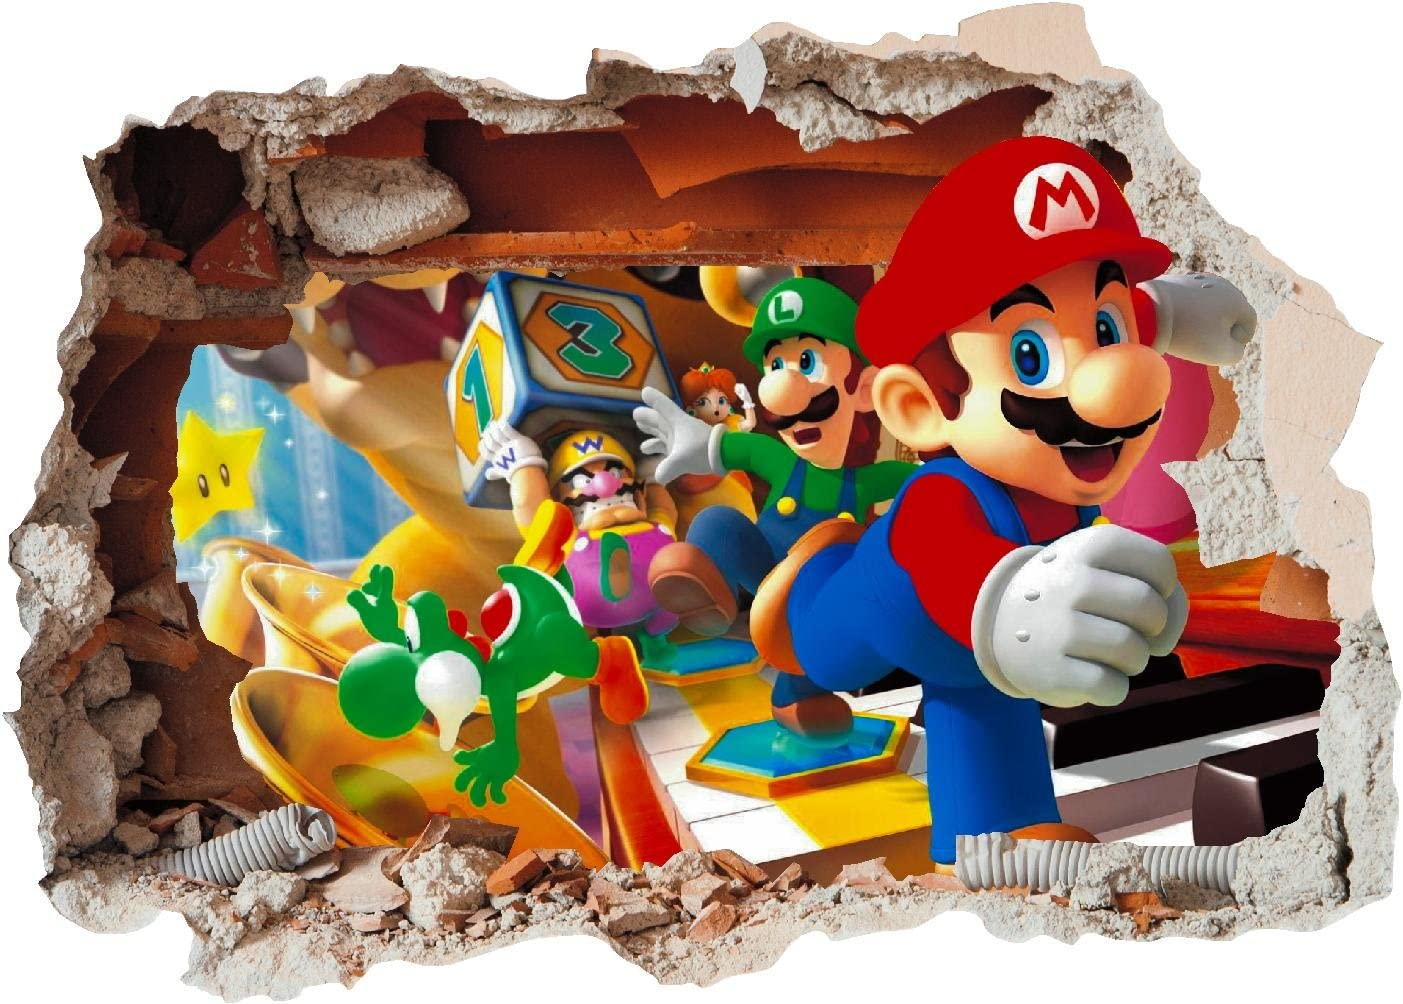 Small 280 x 200mm ss40014 /Vinilo adhesivo para pared de dormitorio infantil Super Mario Brothers Arte Agujero Impreso/